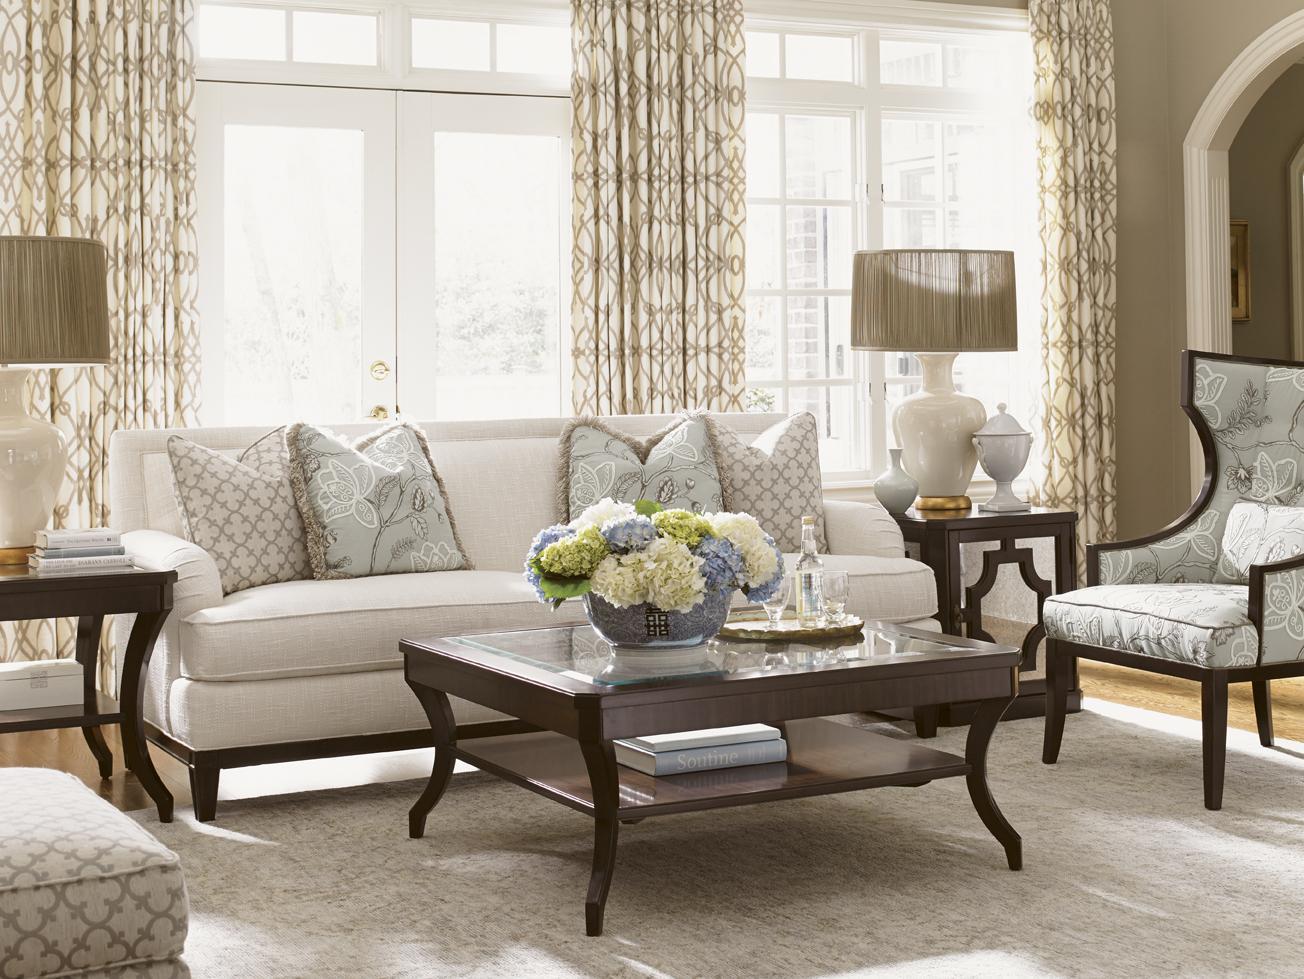 Kensington Place Stationary Living Room Group by Lexington at Johnny Janosik